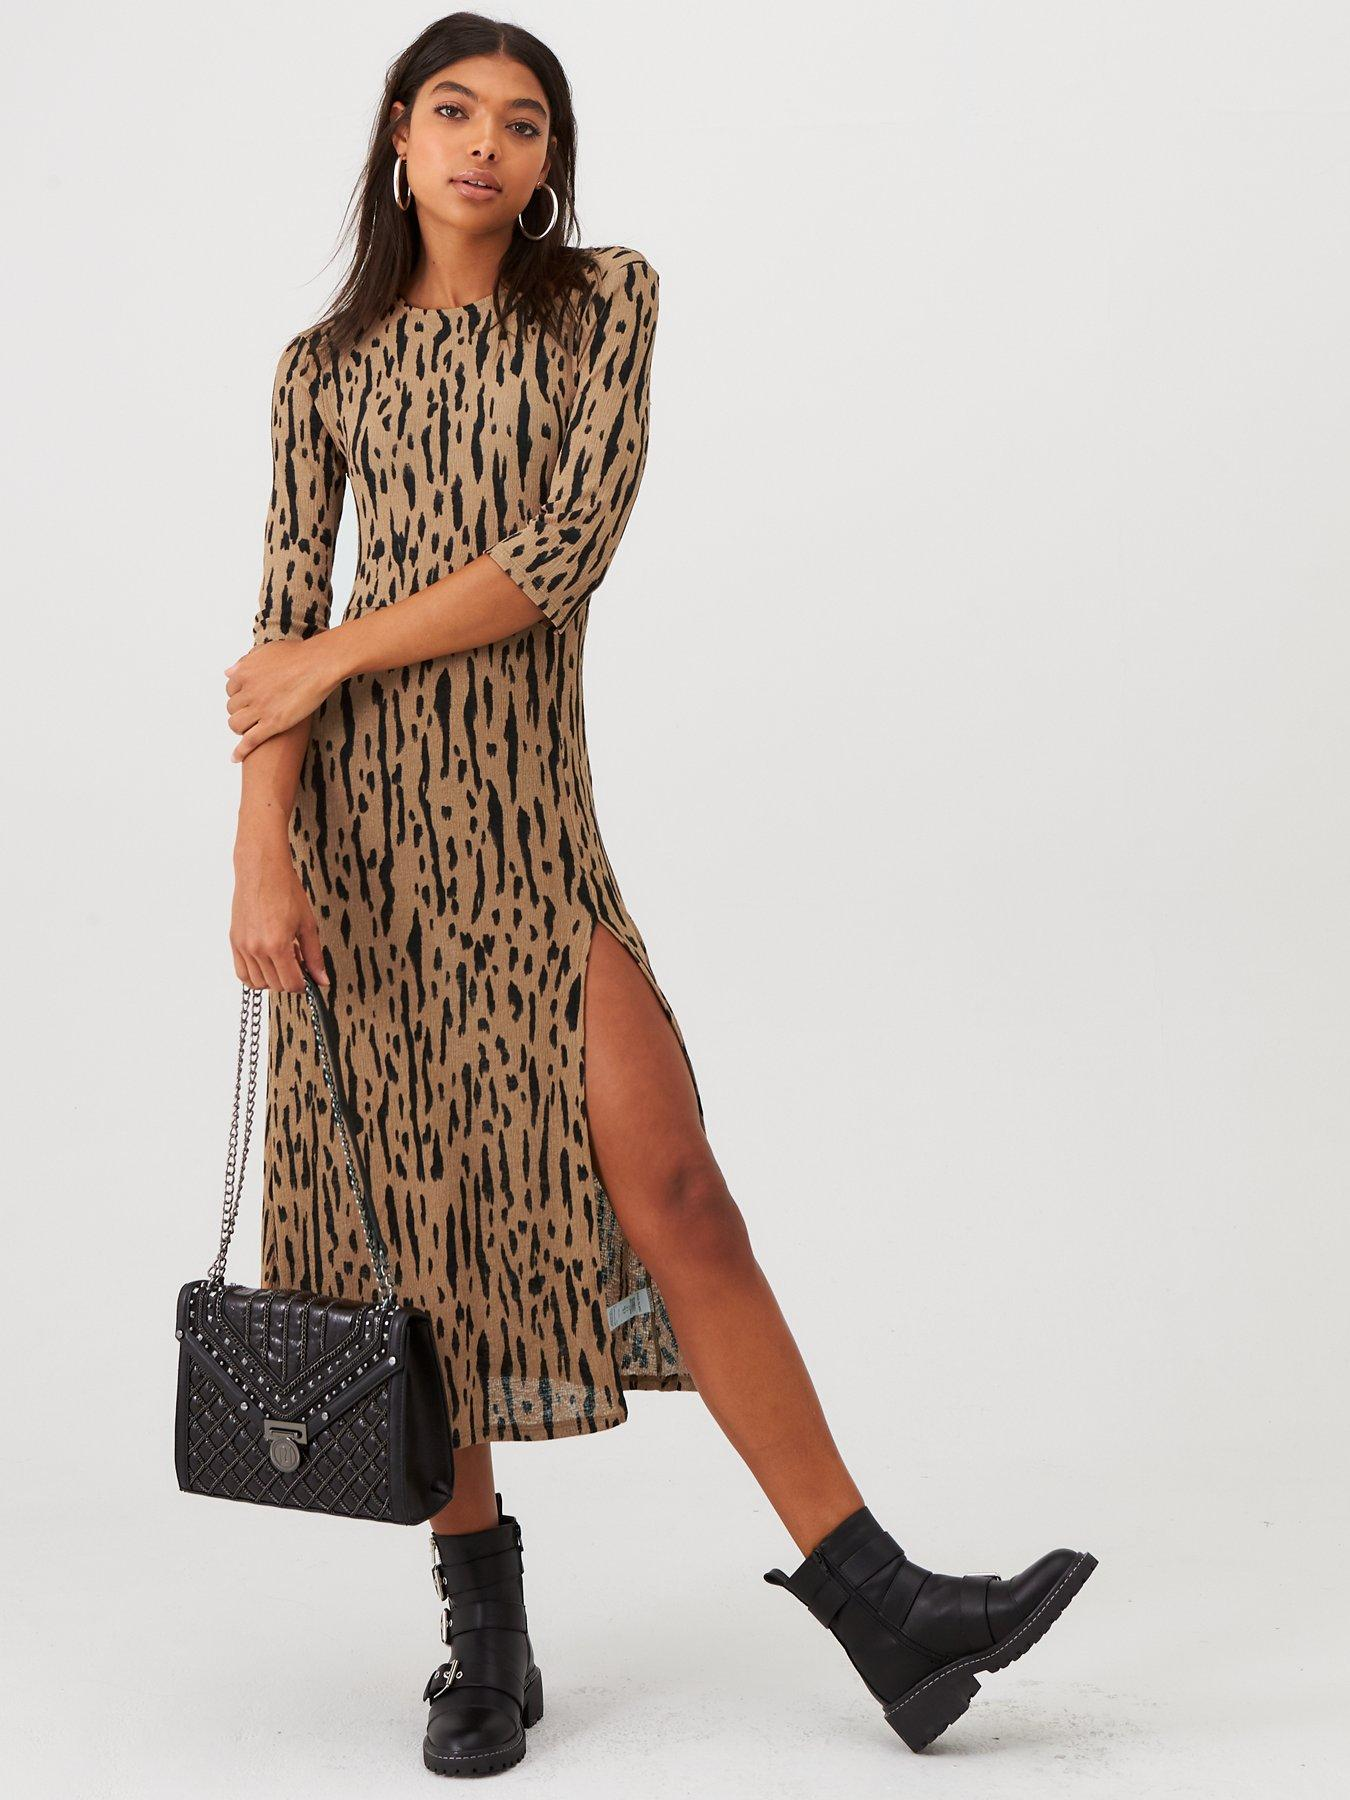 UK Women Oversize Swing Long Shirt Dress V-neck Long Sleeve Linen Holiday Kaftan